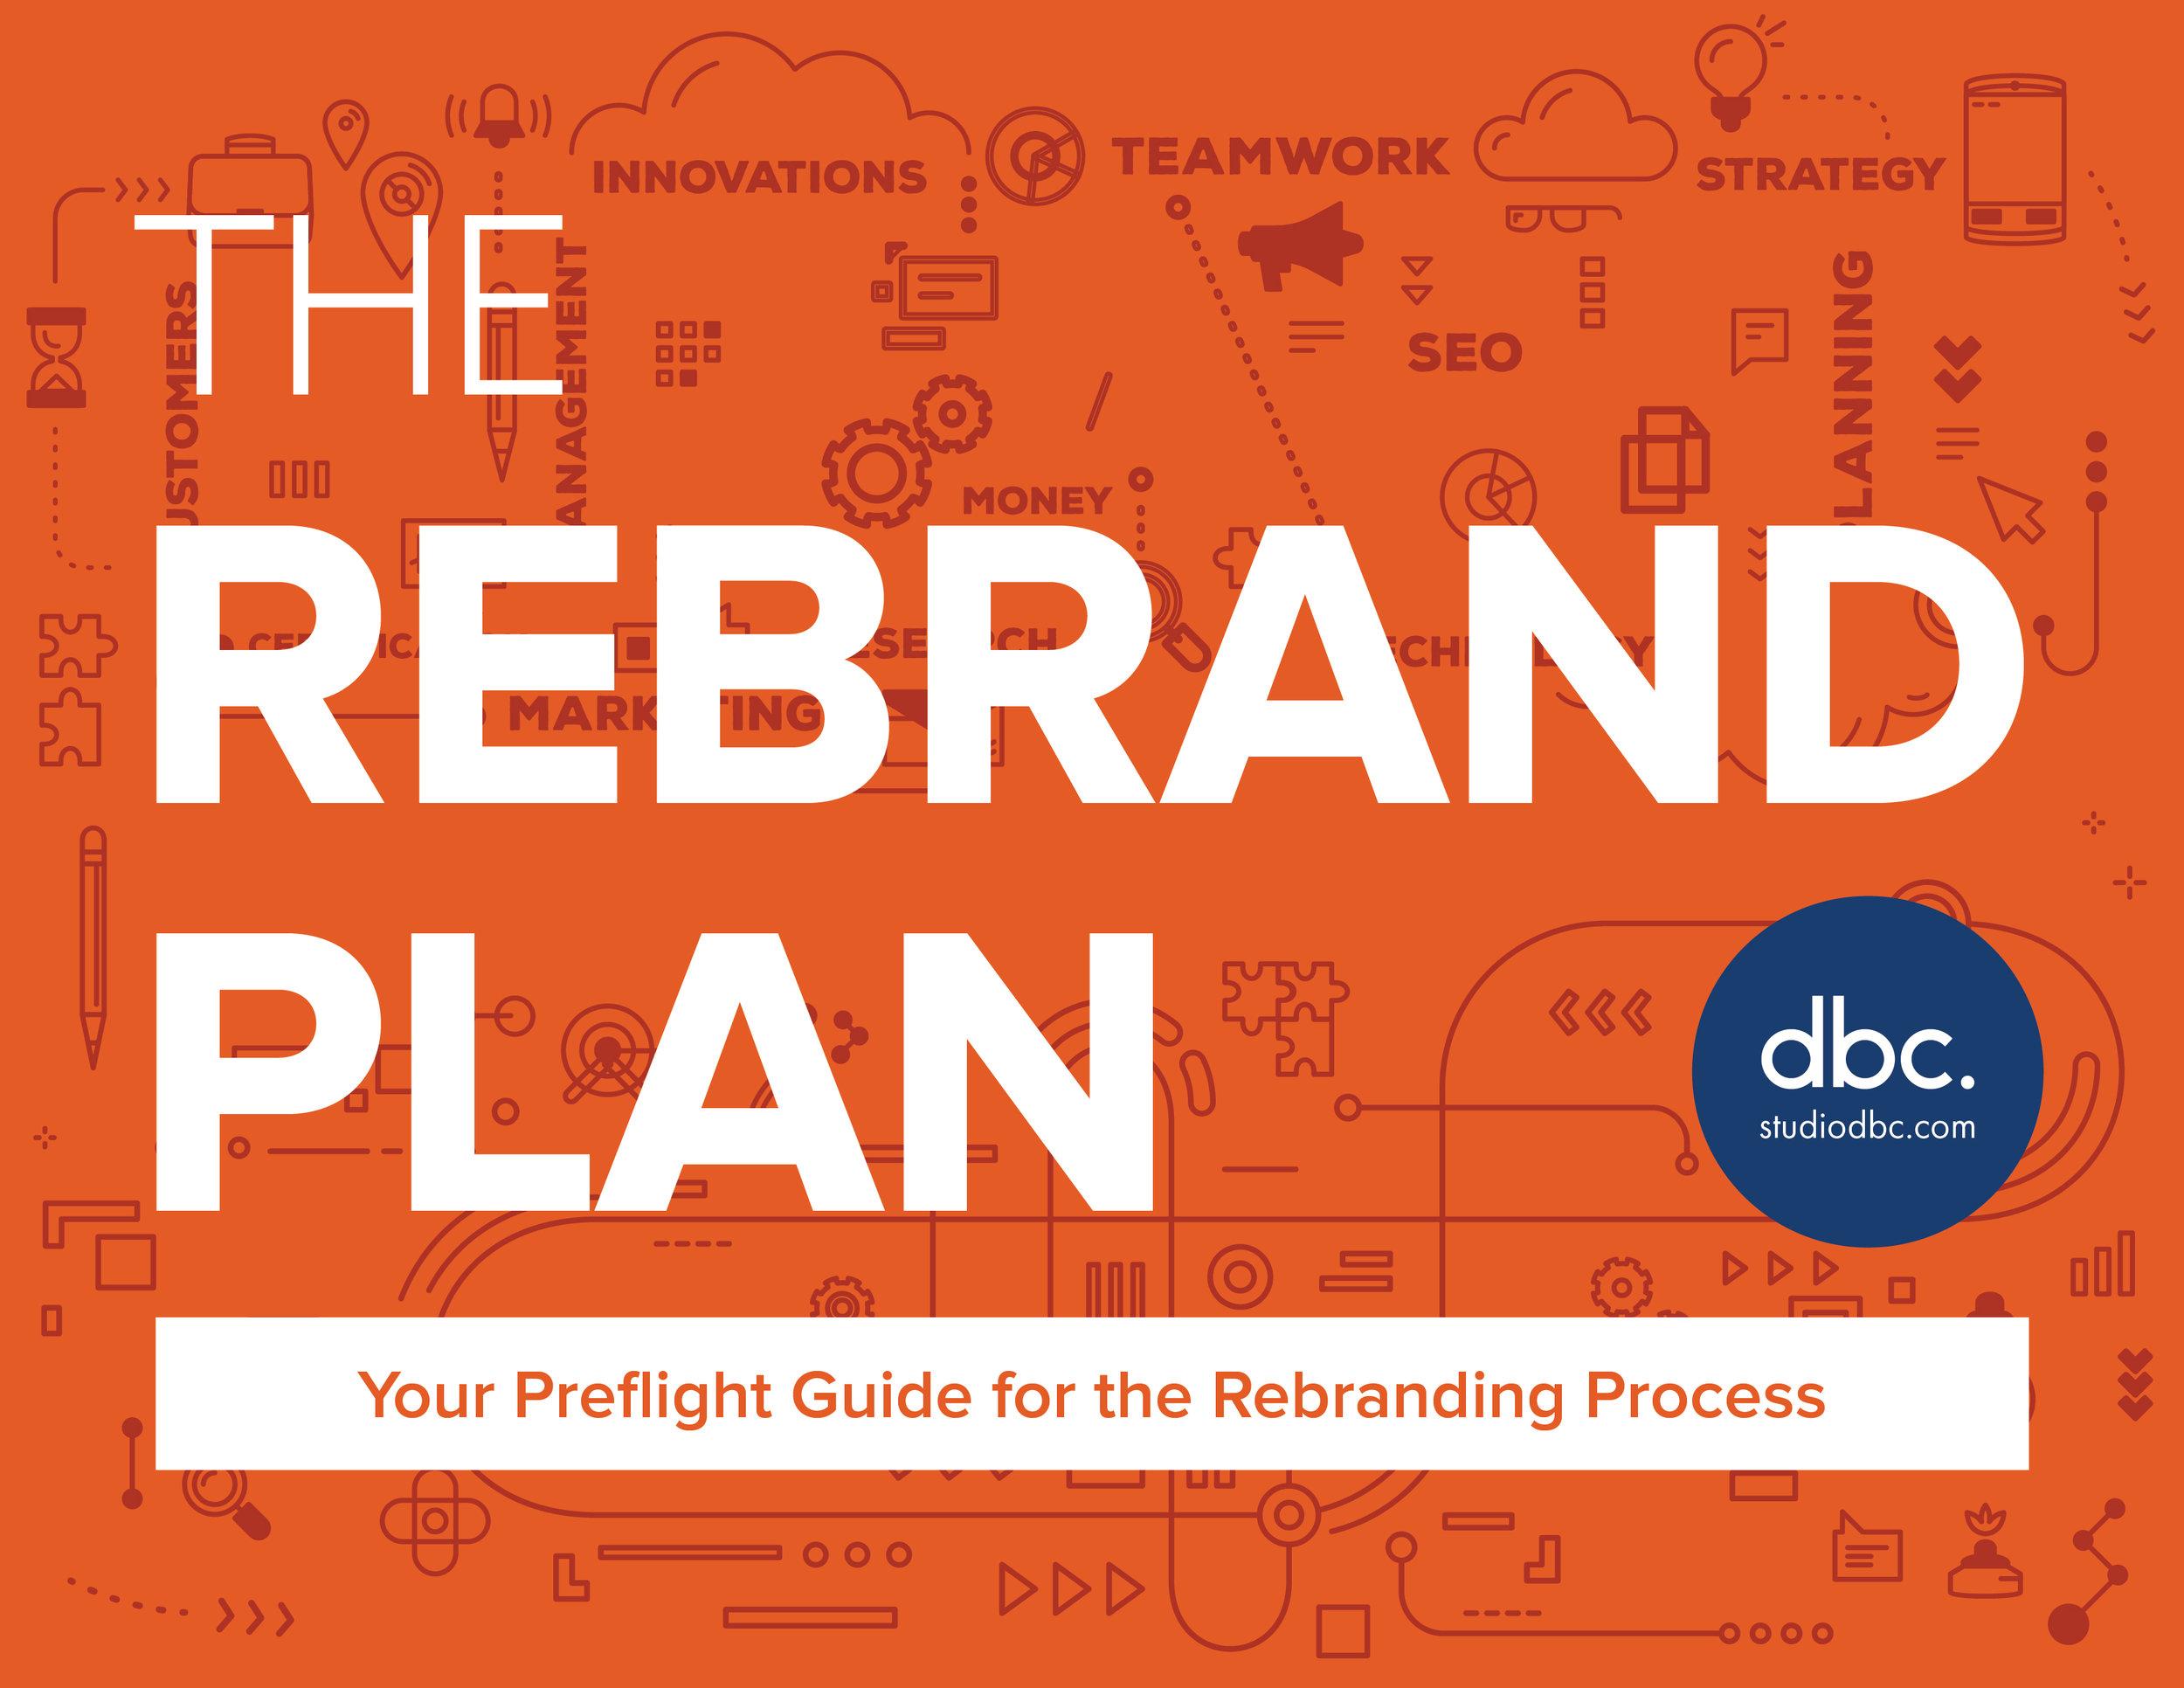 The Rebrand Plan by DBC